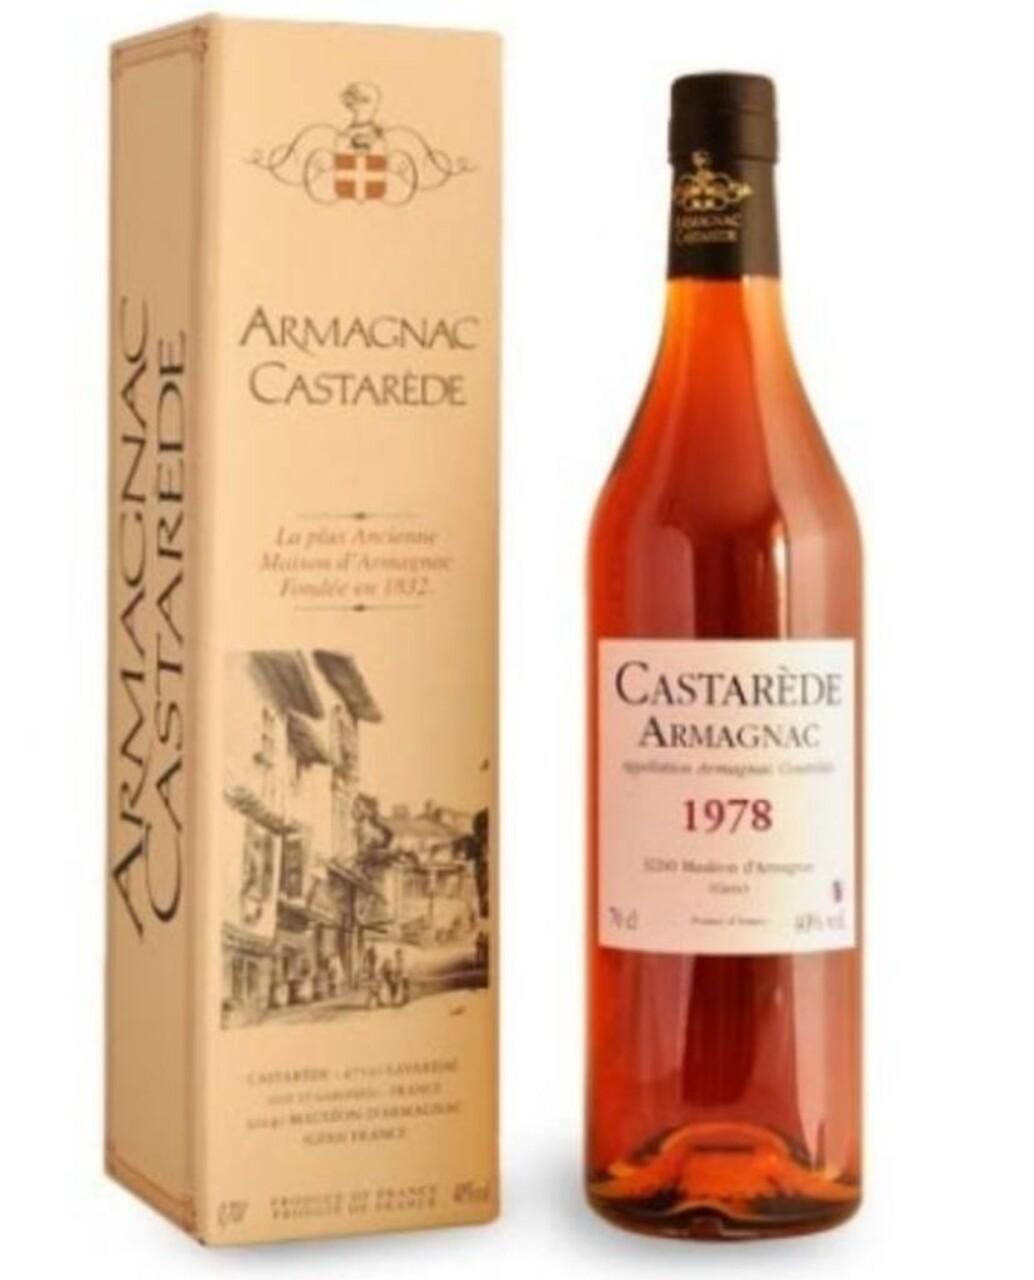 ARMAGNAC CASTAREDE 1978